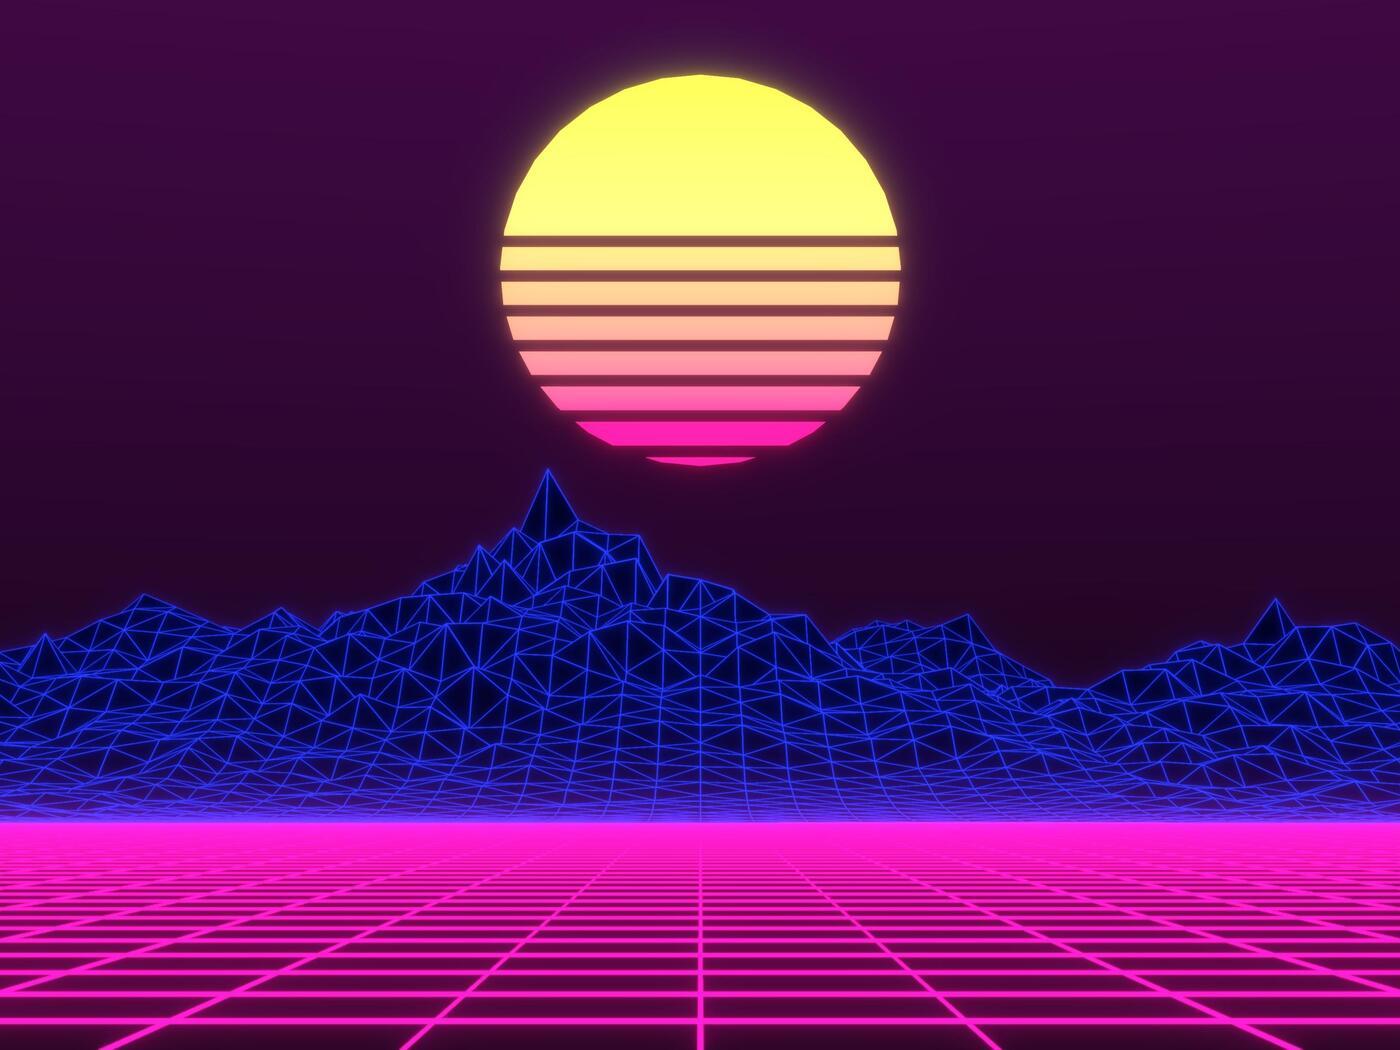 neon-retrowave-minimalism-4k-rx.jpg